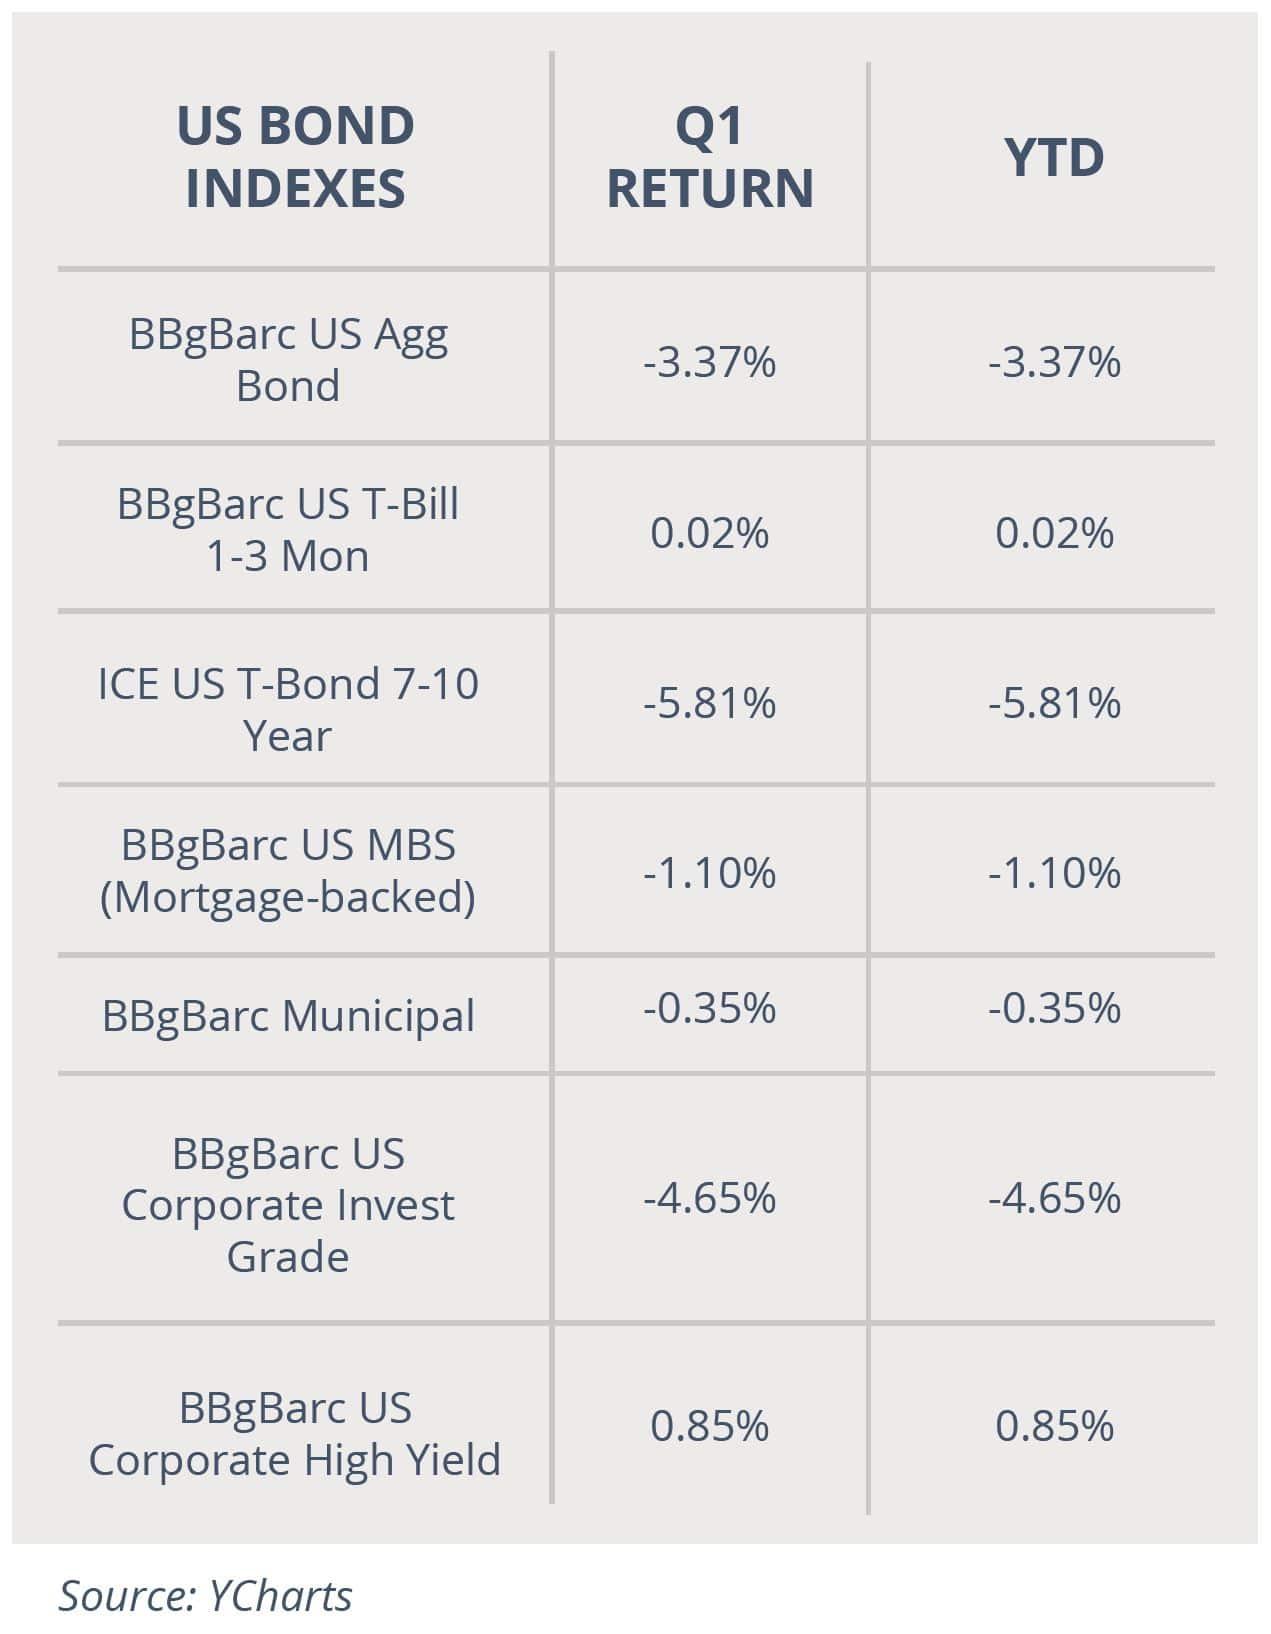 US Bond Indexes April 2021